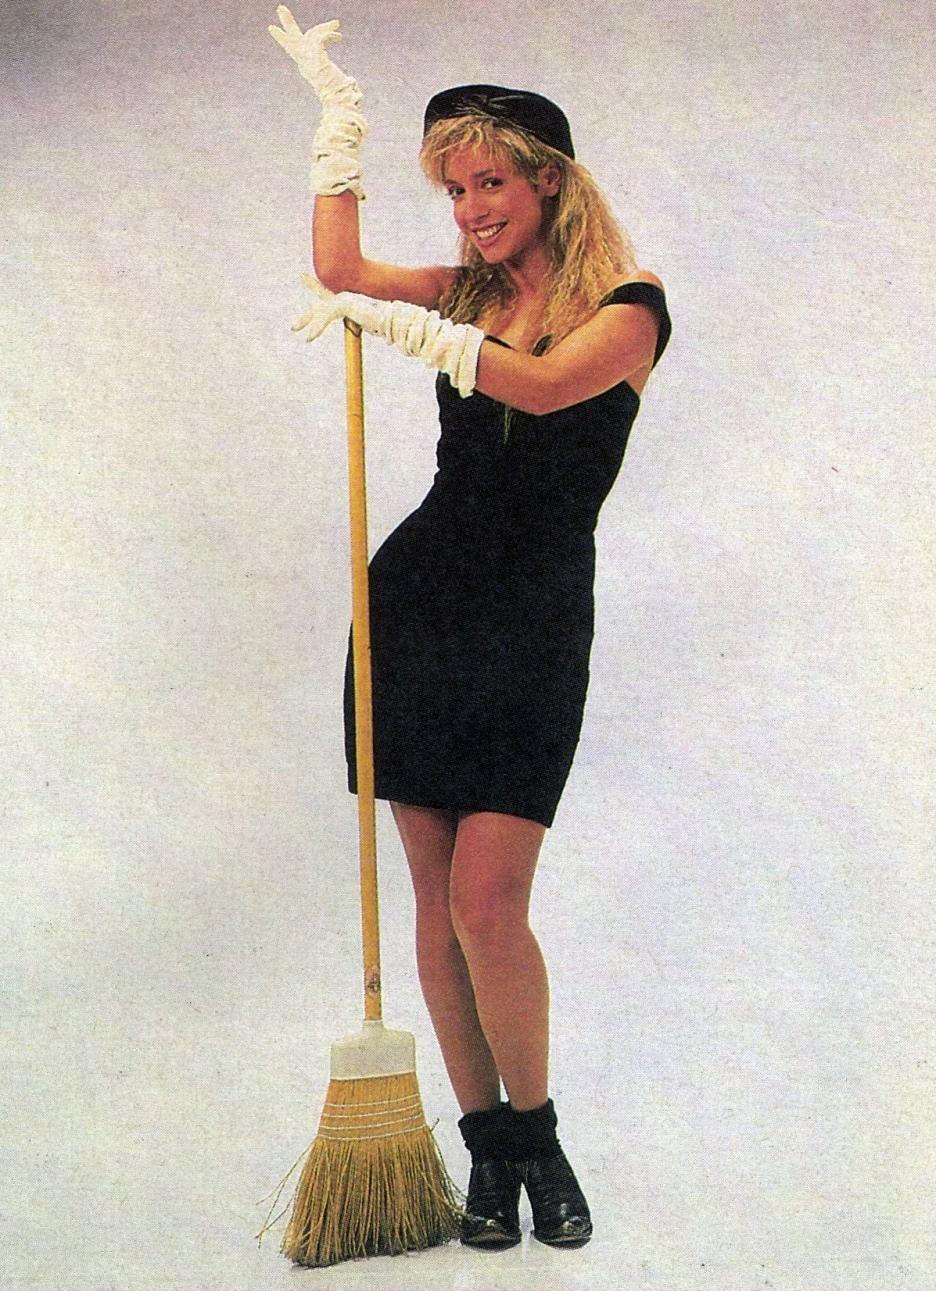 Arantxa Sanchez 4 Grand Slam singles titles,Patricia Ja Lee Sex video Flora Campbell,Angie Milliken